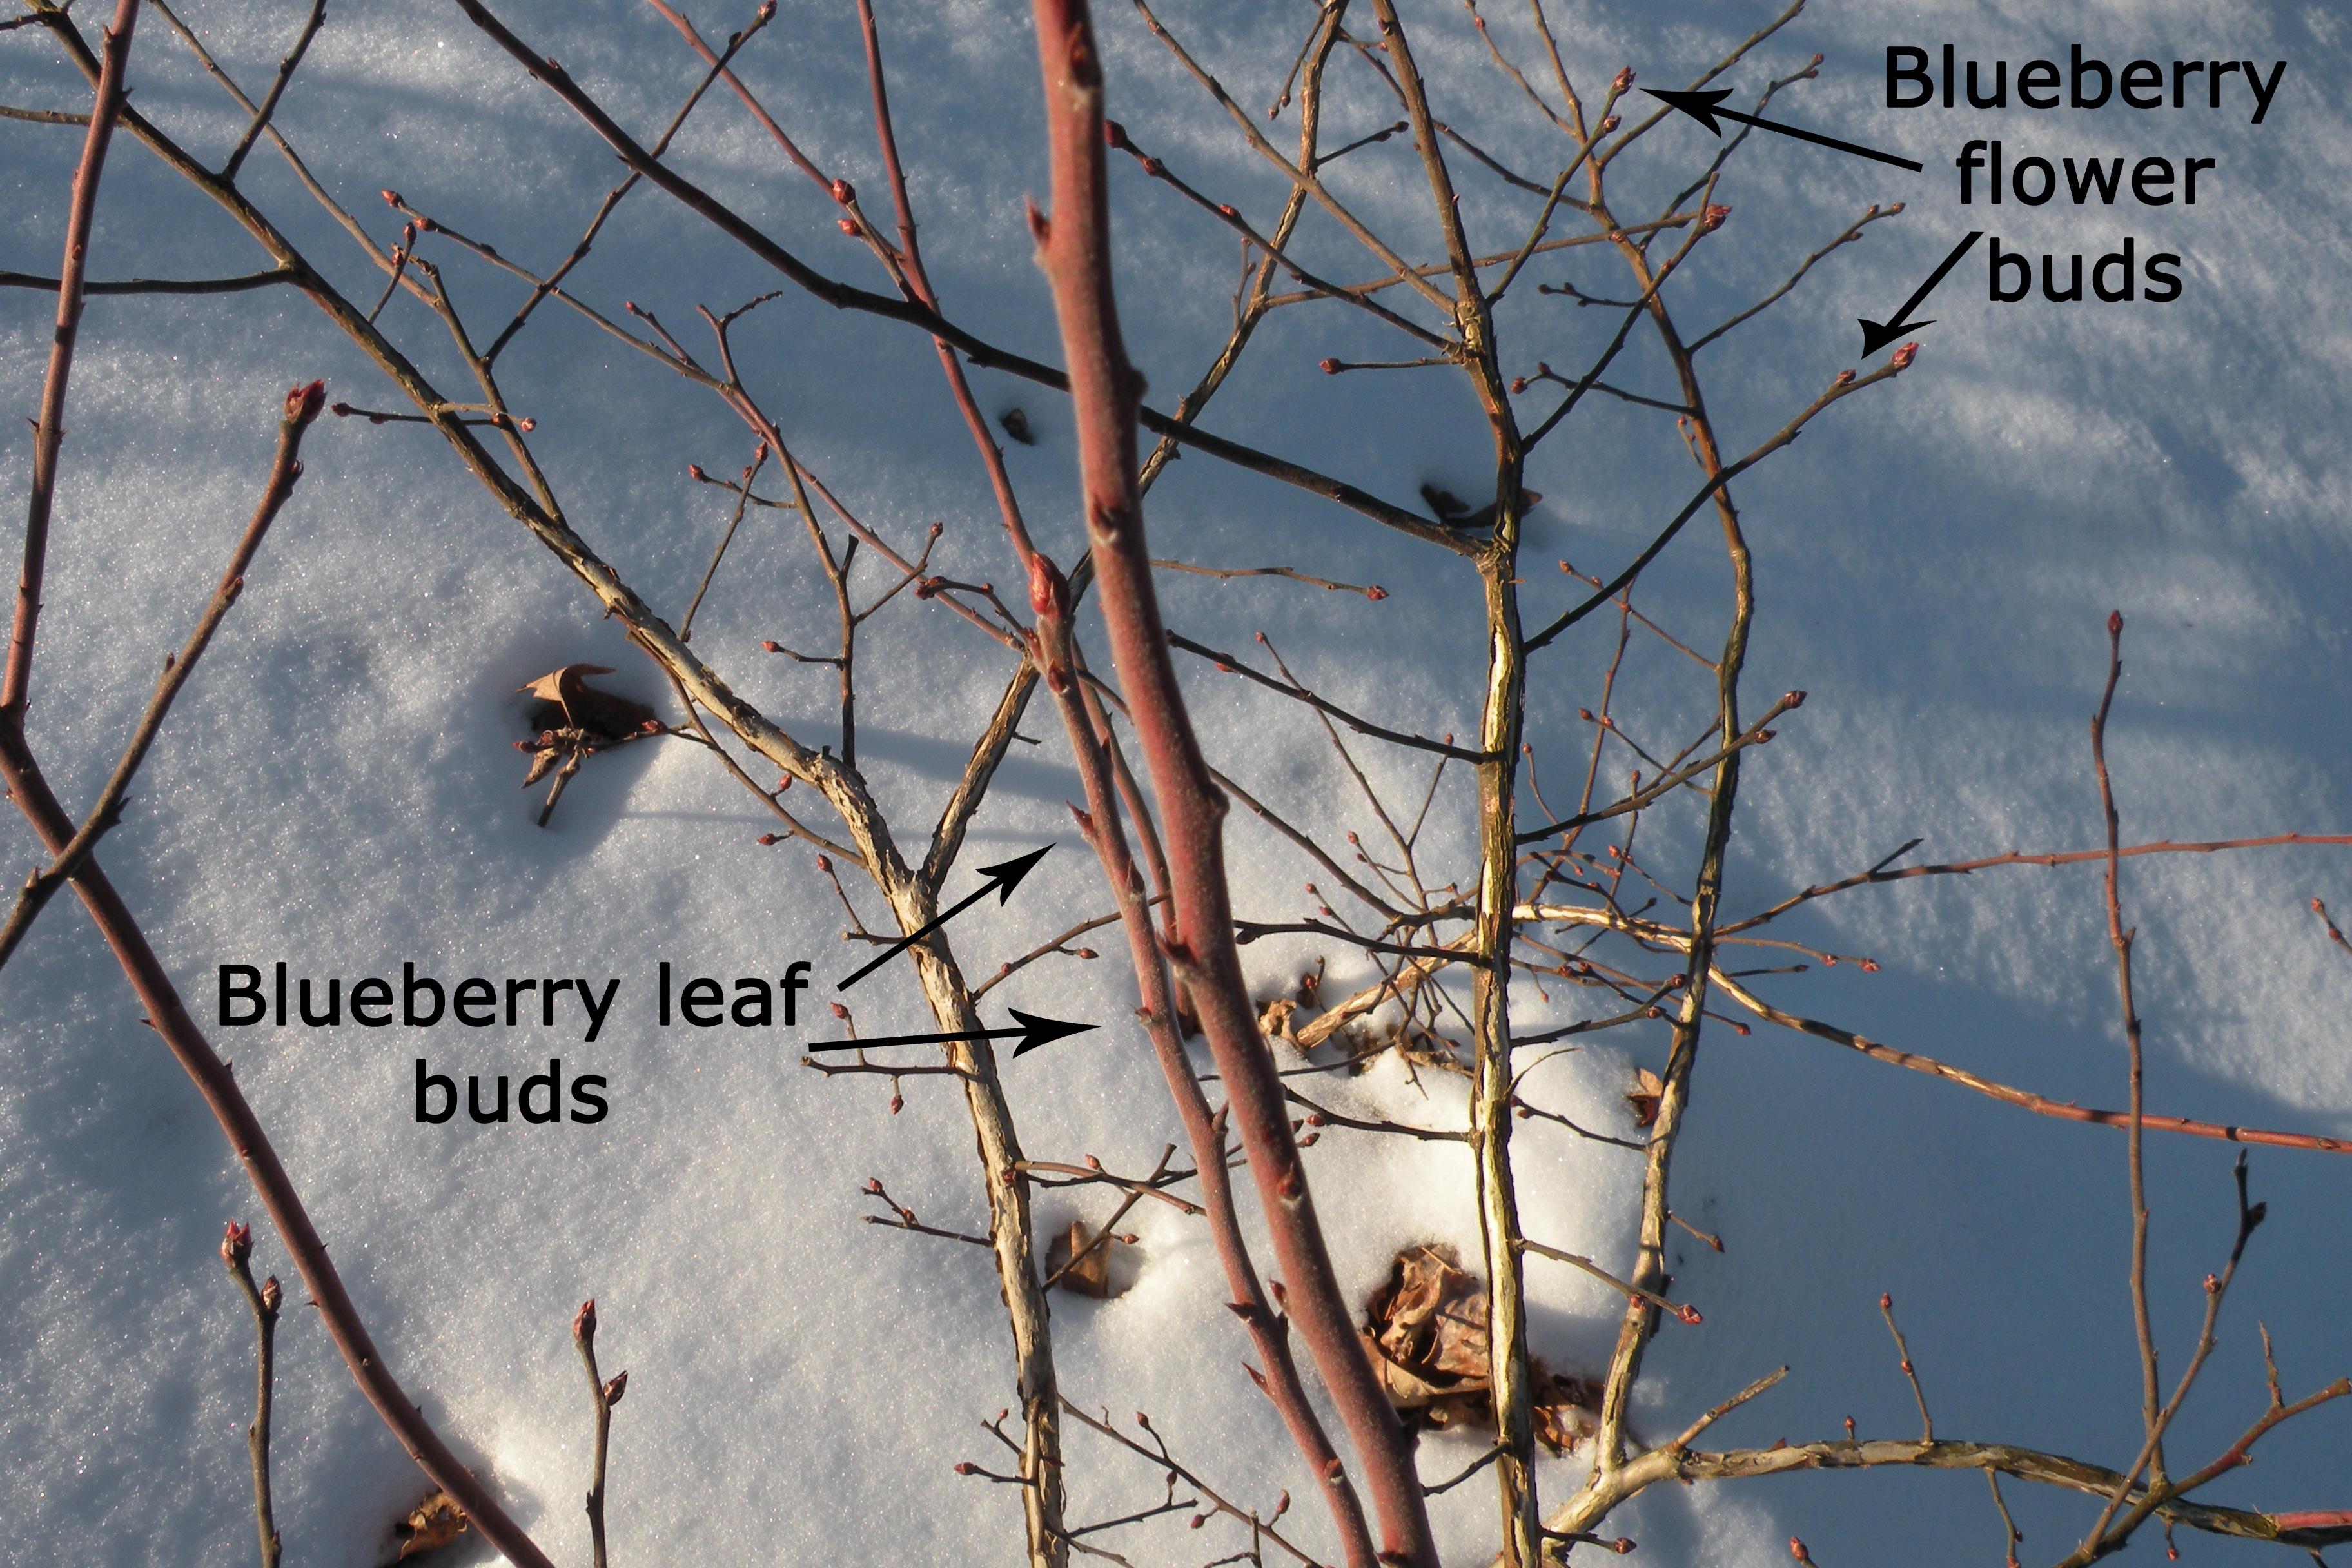 identifying dormant fruit tree buds